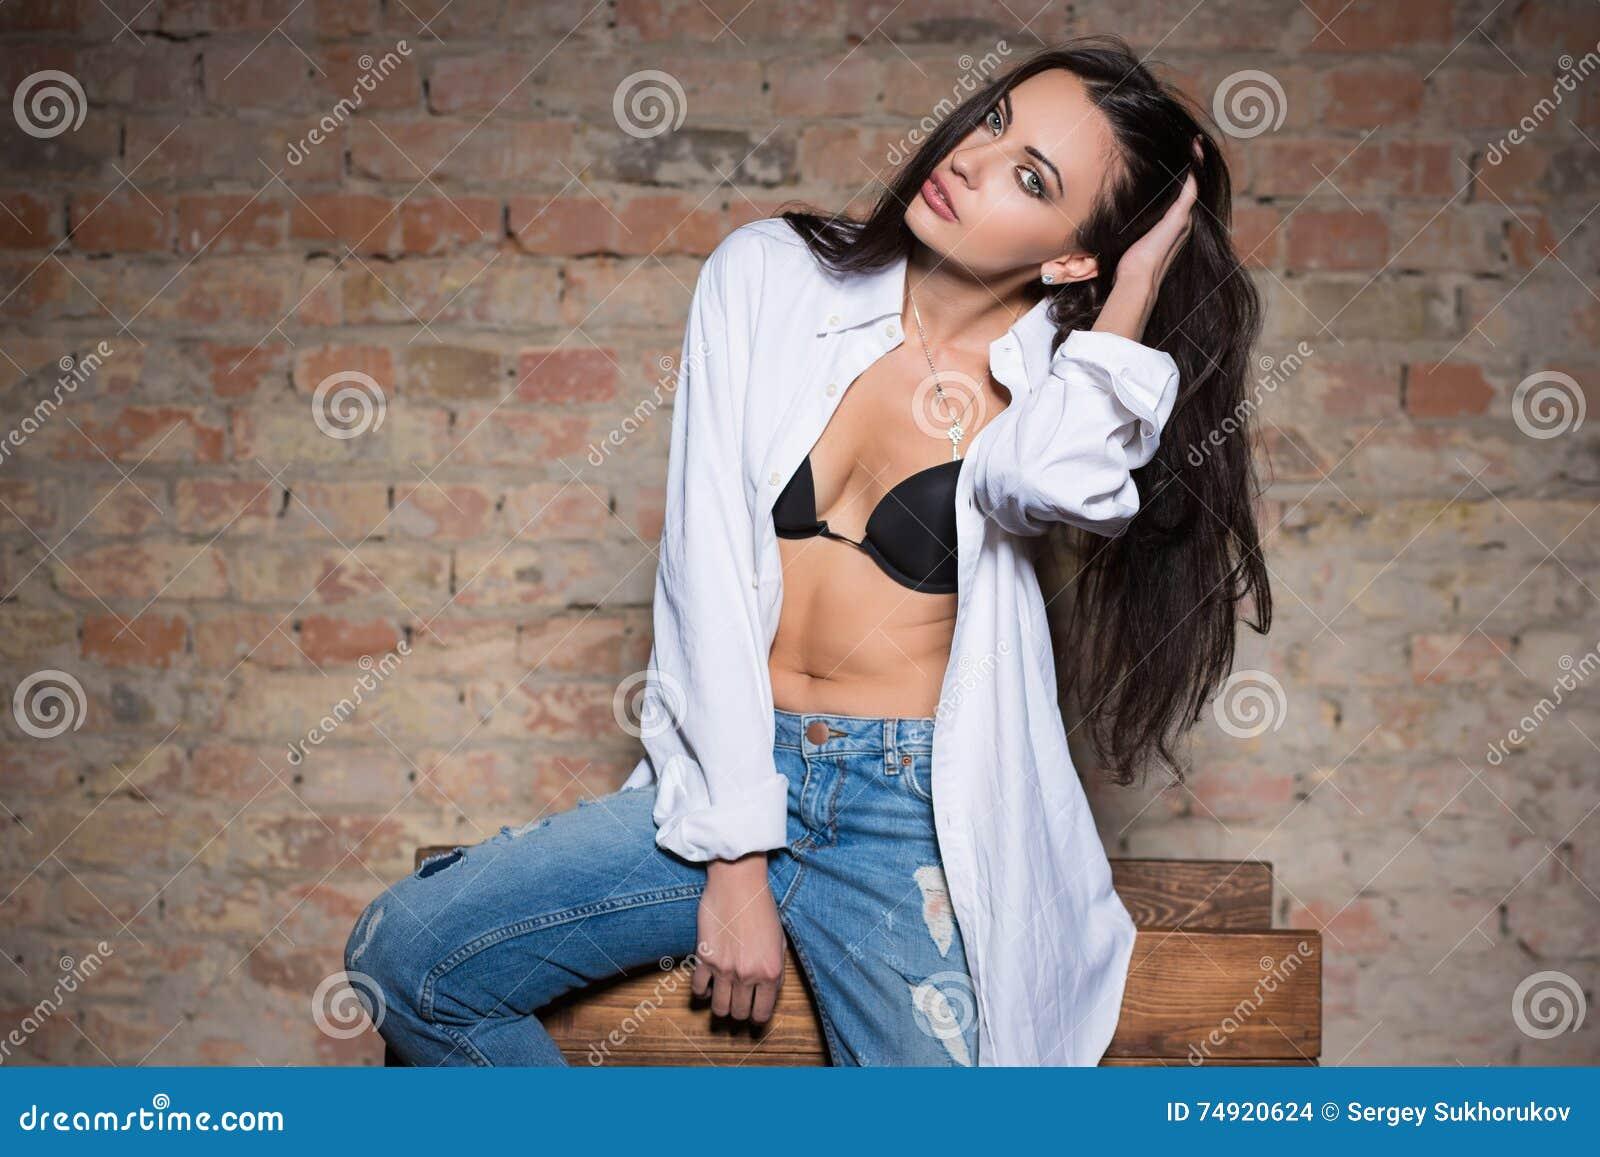 mignon jeune adolescent sexe vidéo asiatique transexuelle porno